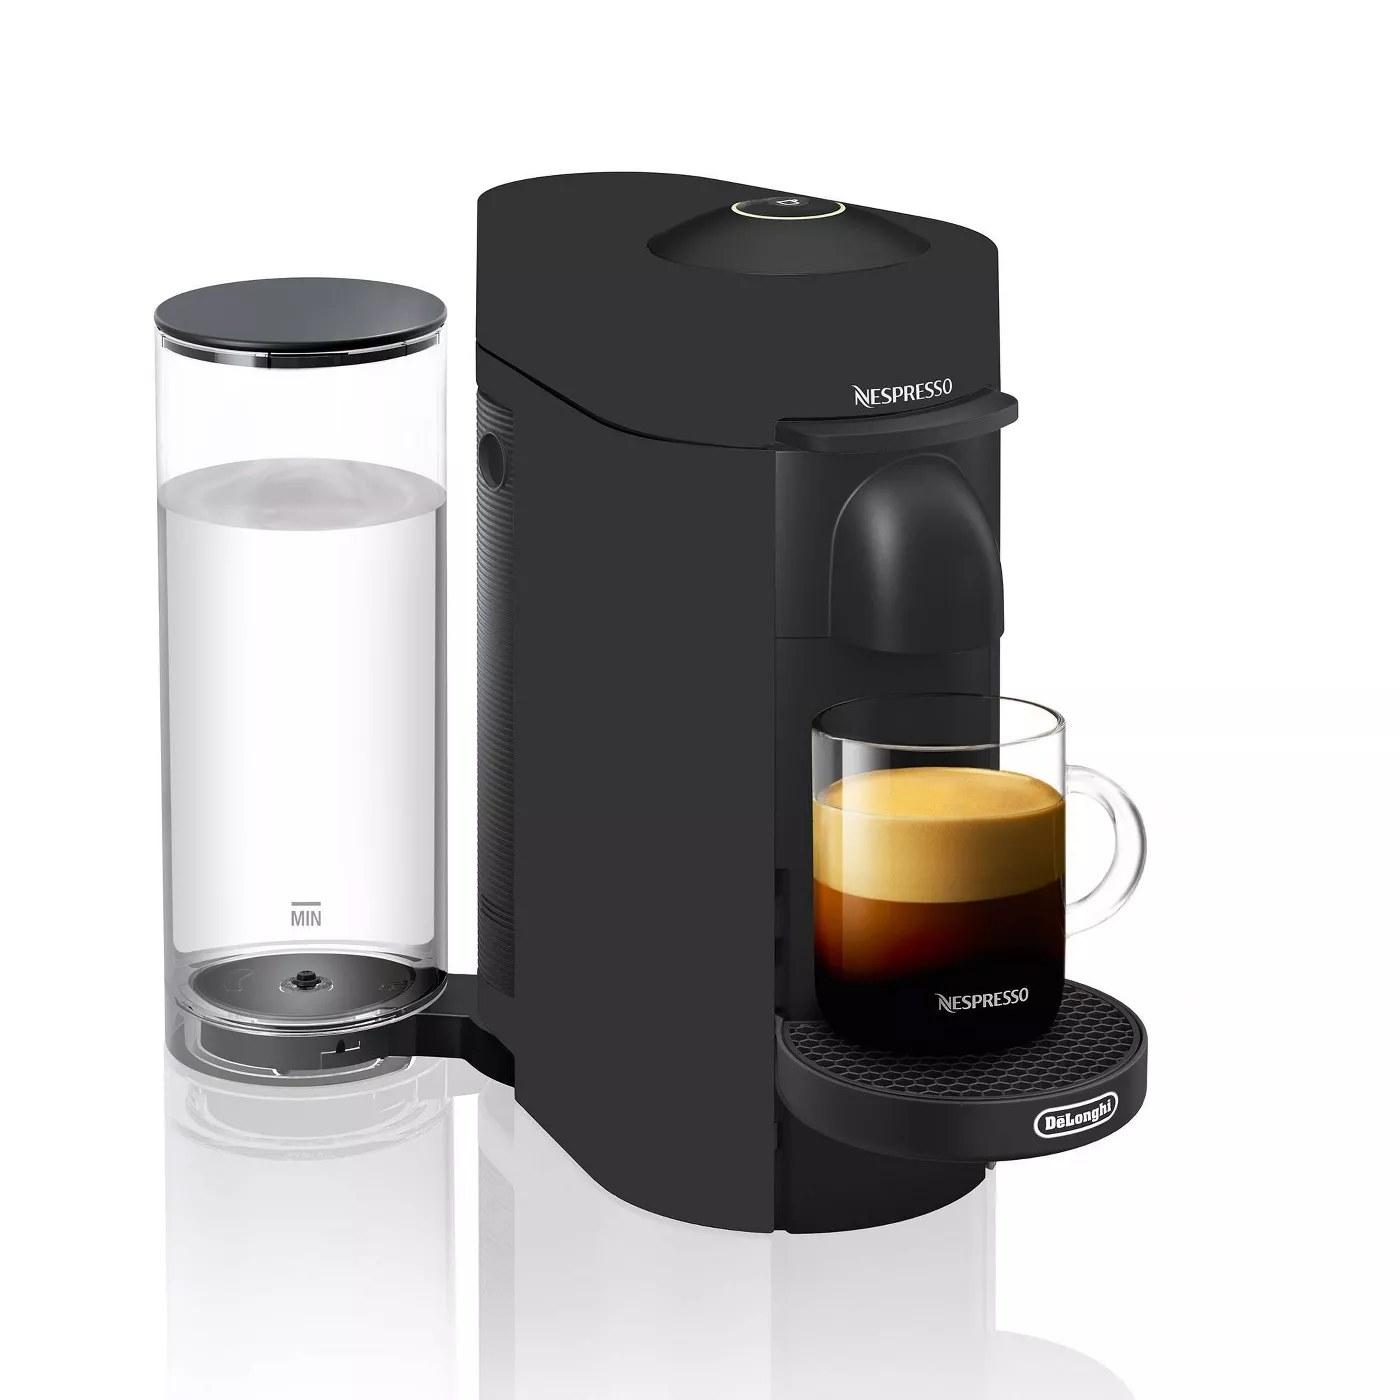 The black Nespresso maker brewing a caffeinated beverage